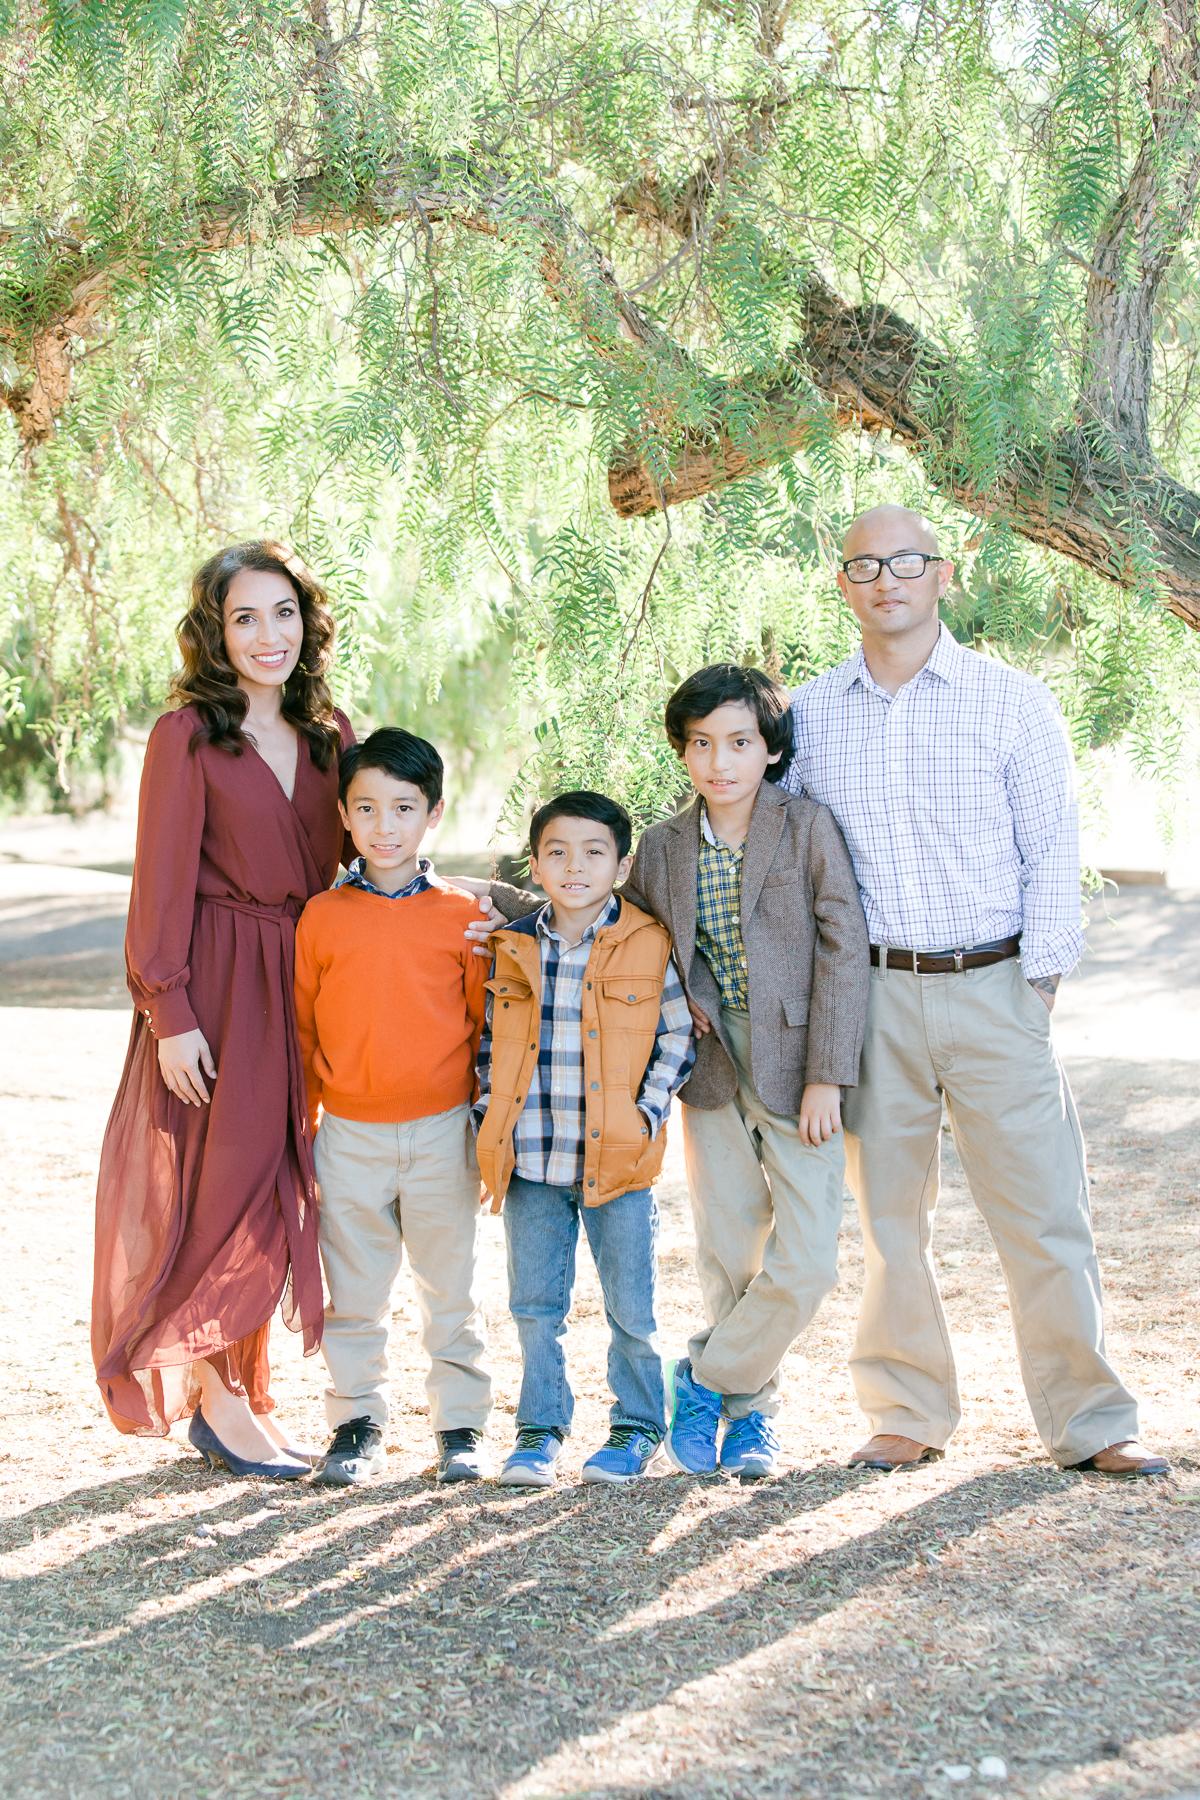 NEMA Photo I.Knightly008 - The Almodovar Family | Los Penasquitos canyon preserve | San Diego Photographer